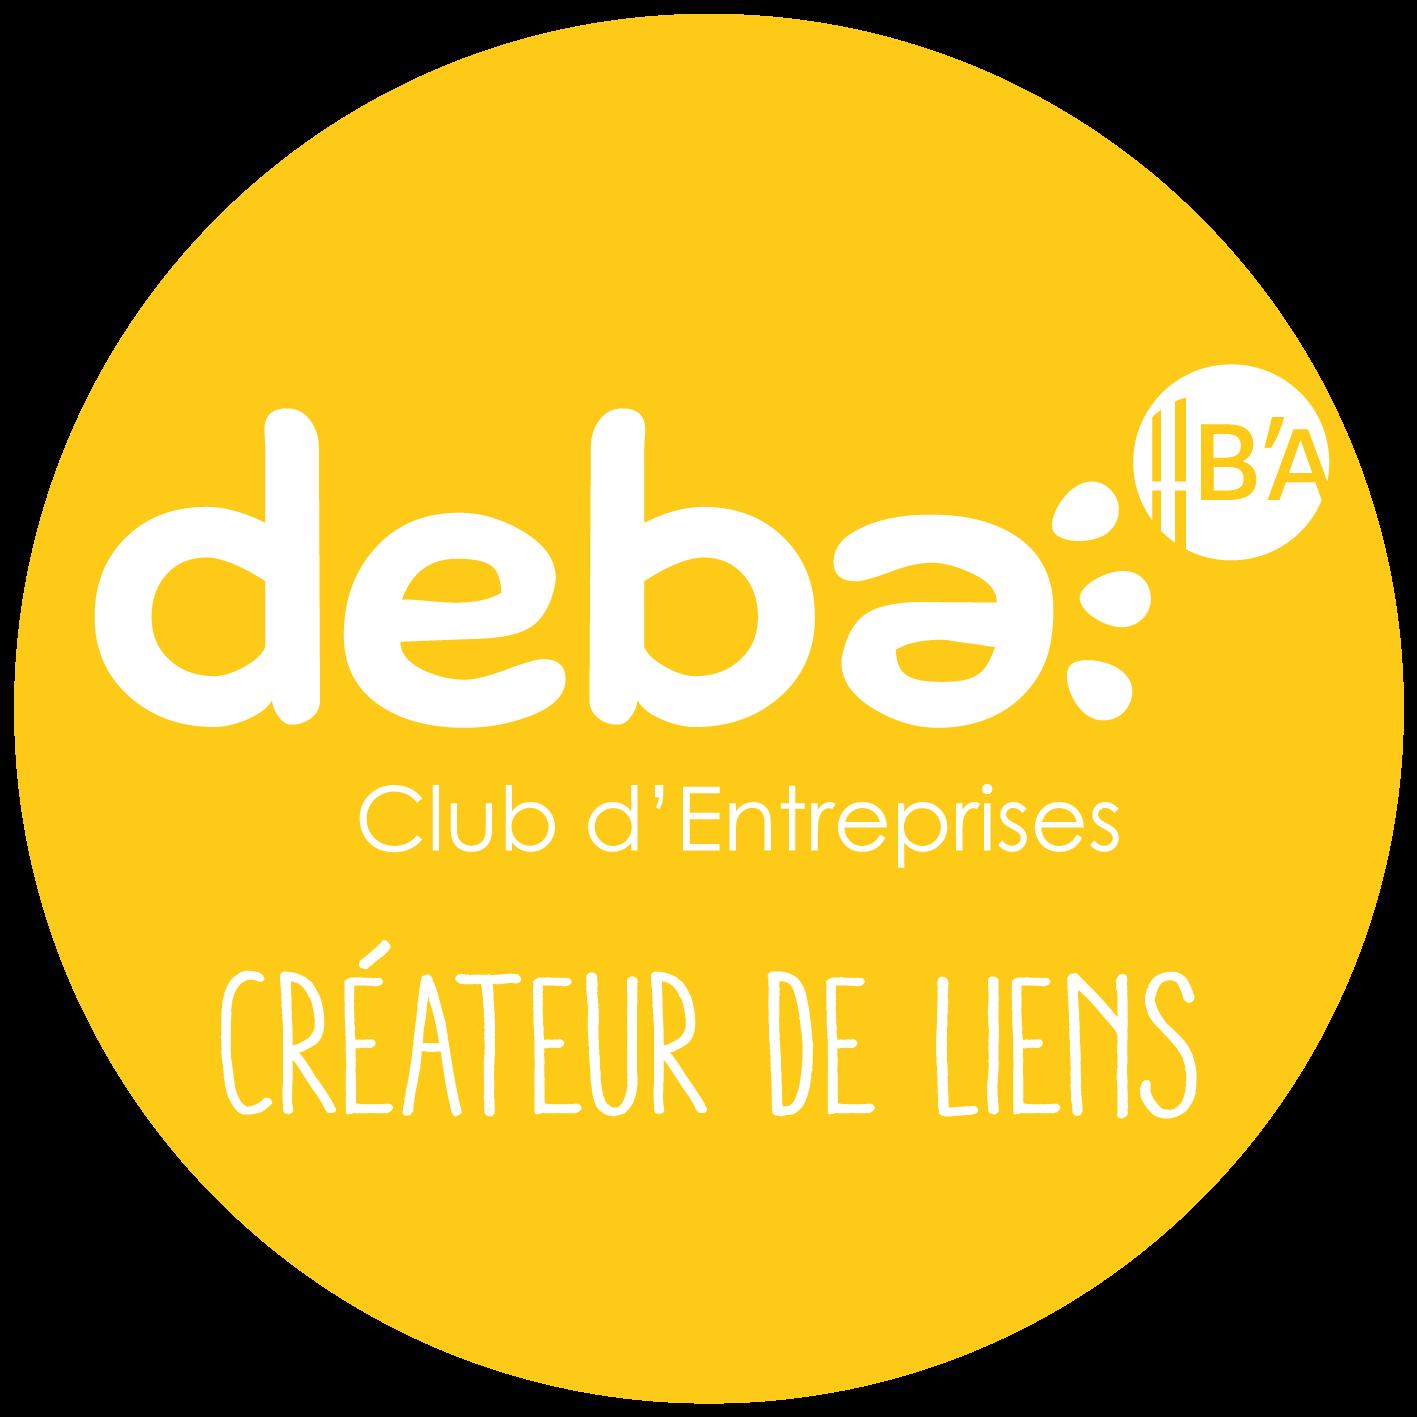 Club d'Entreprises DEBA